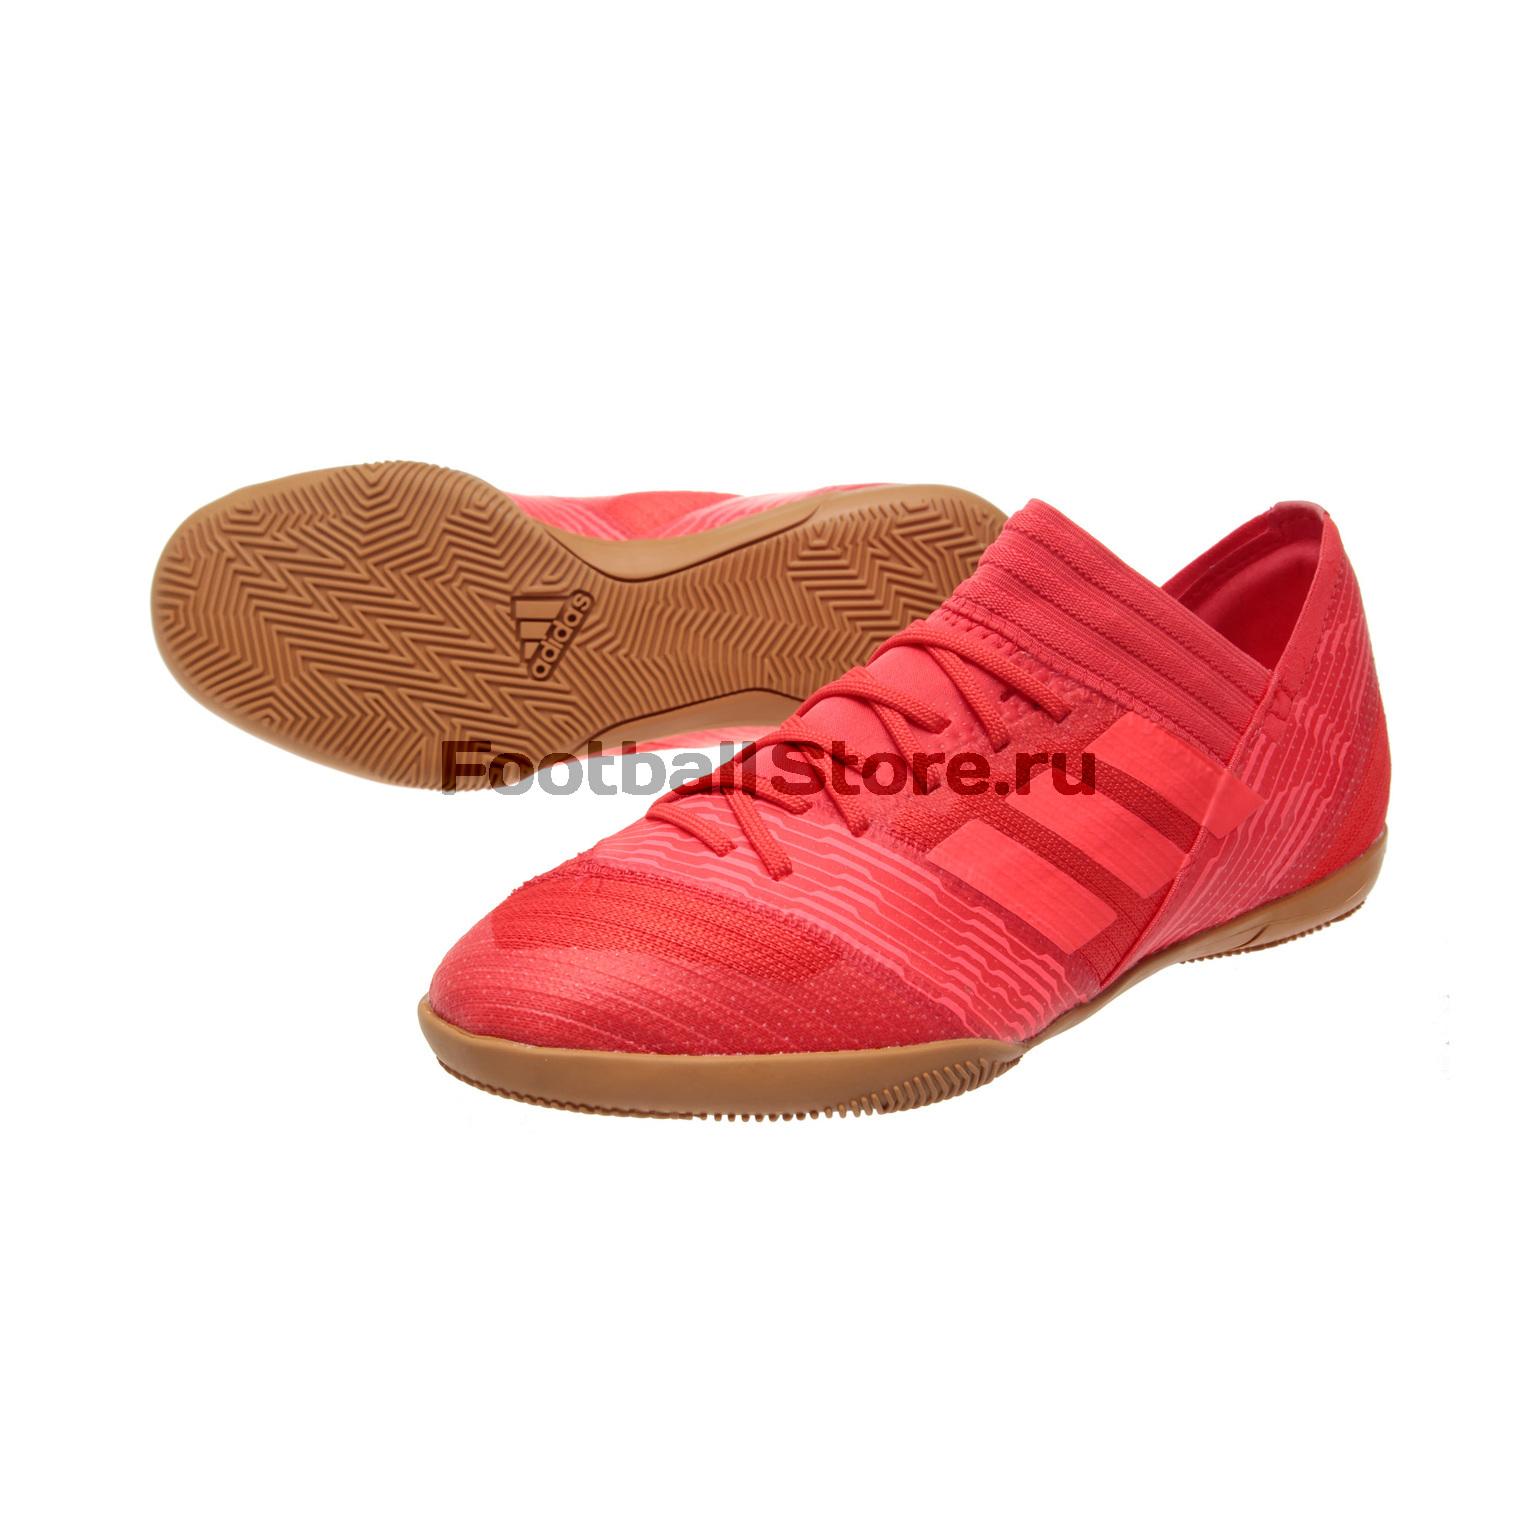 Обувь для зала Adidas Nemeziz Tango 17.3 IN JR CP9183 обувь для зала adidas ace tango 18 3 in jr cp9075